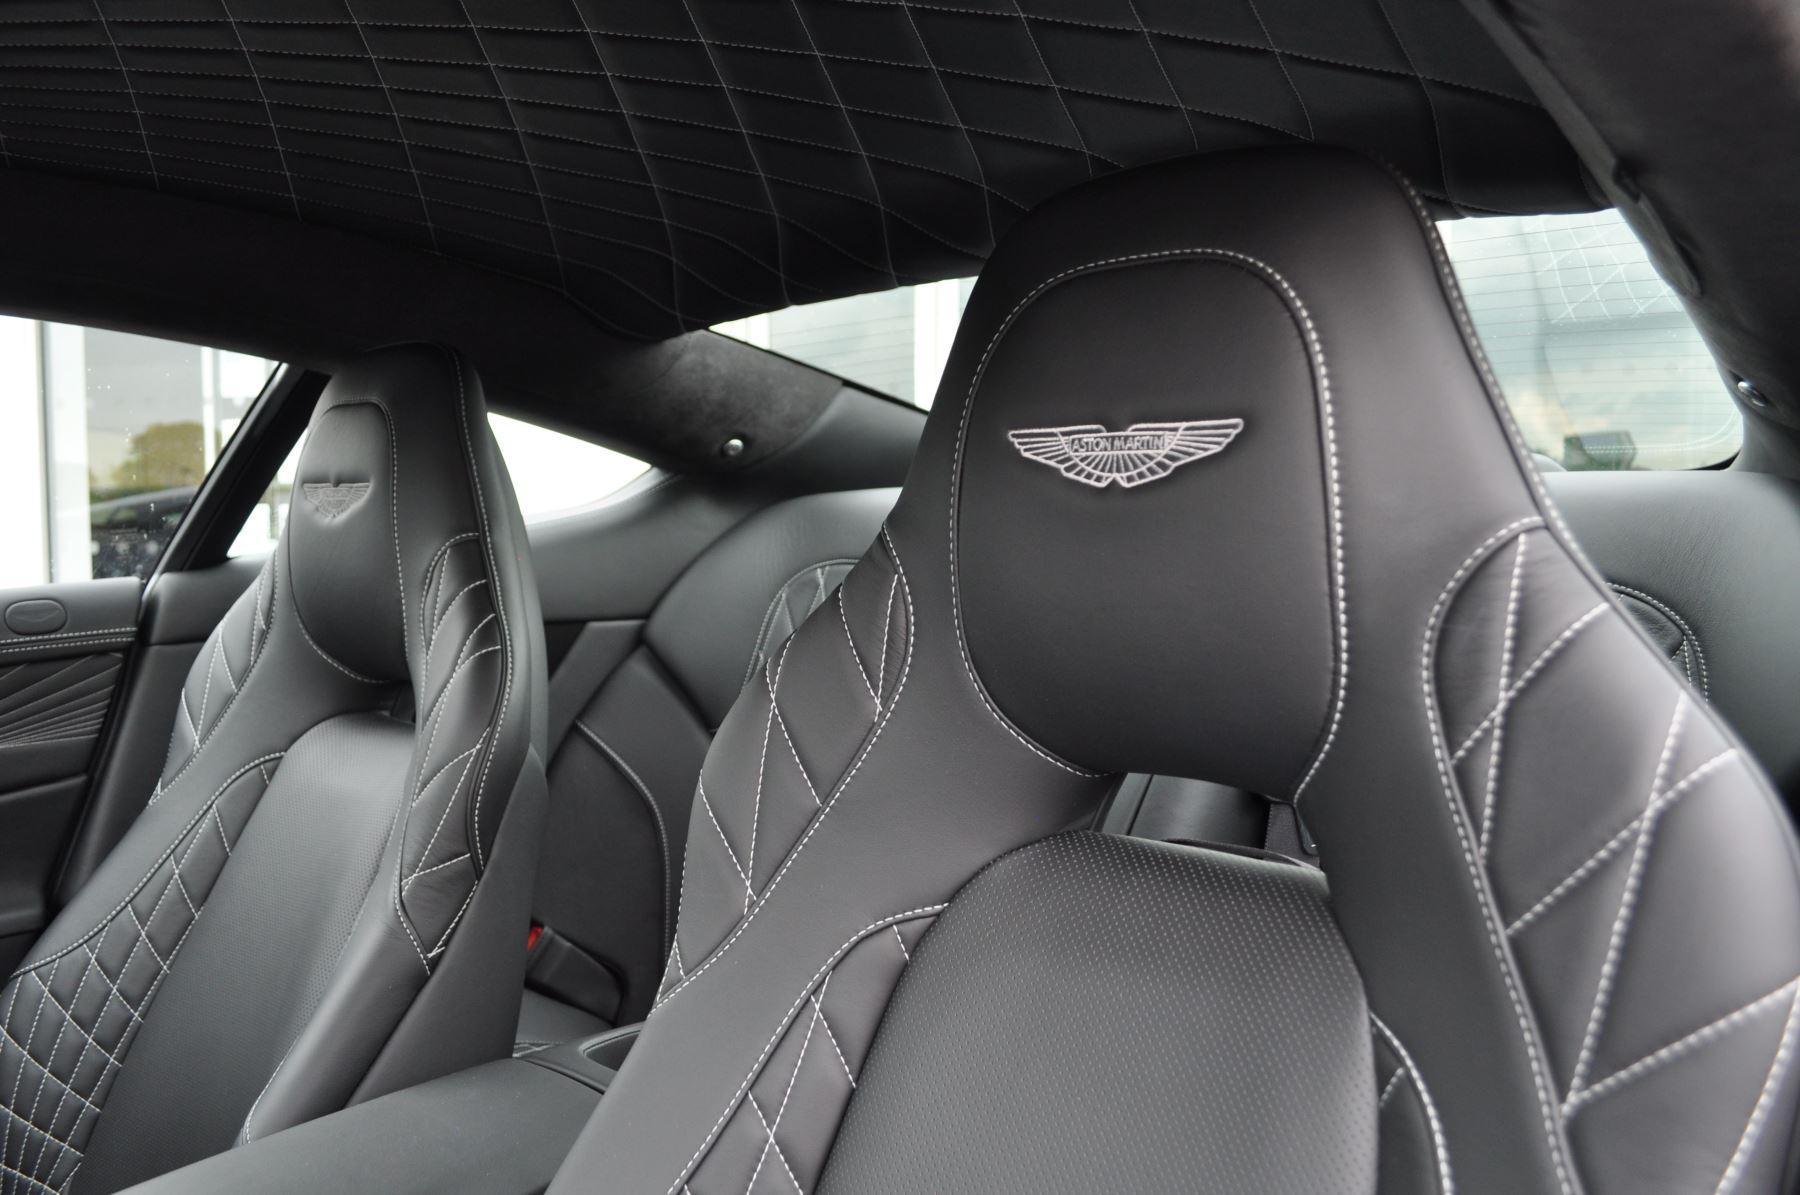 Aston Martin Vanquish S V12 [595] S 2+2 2dr Touchtronic image 34